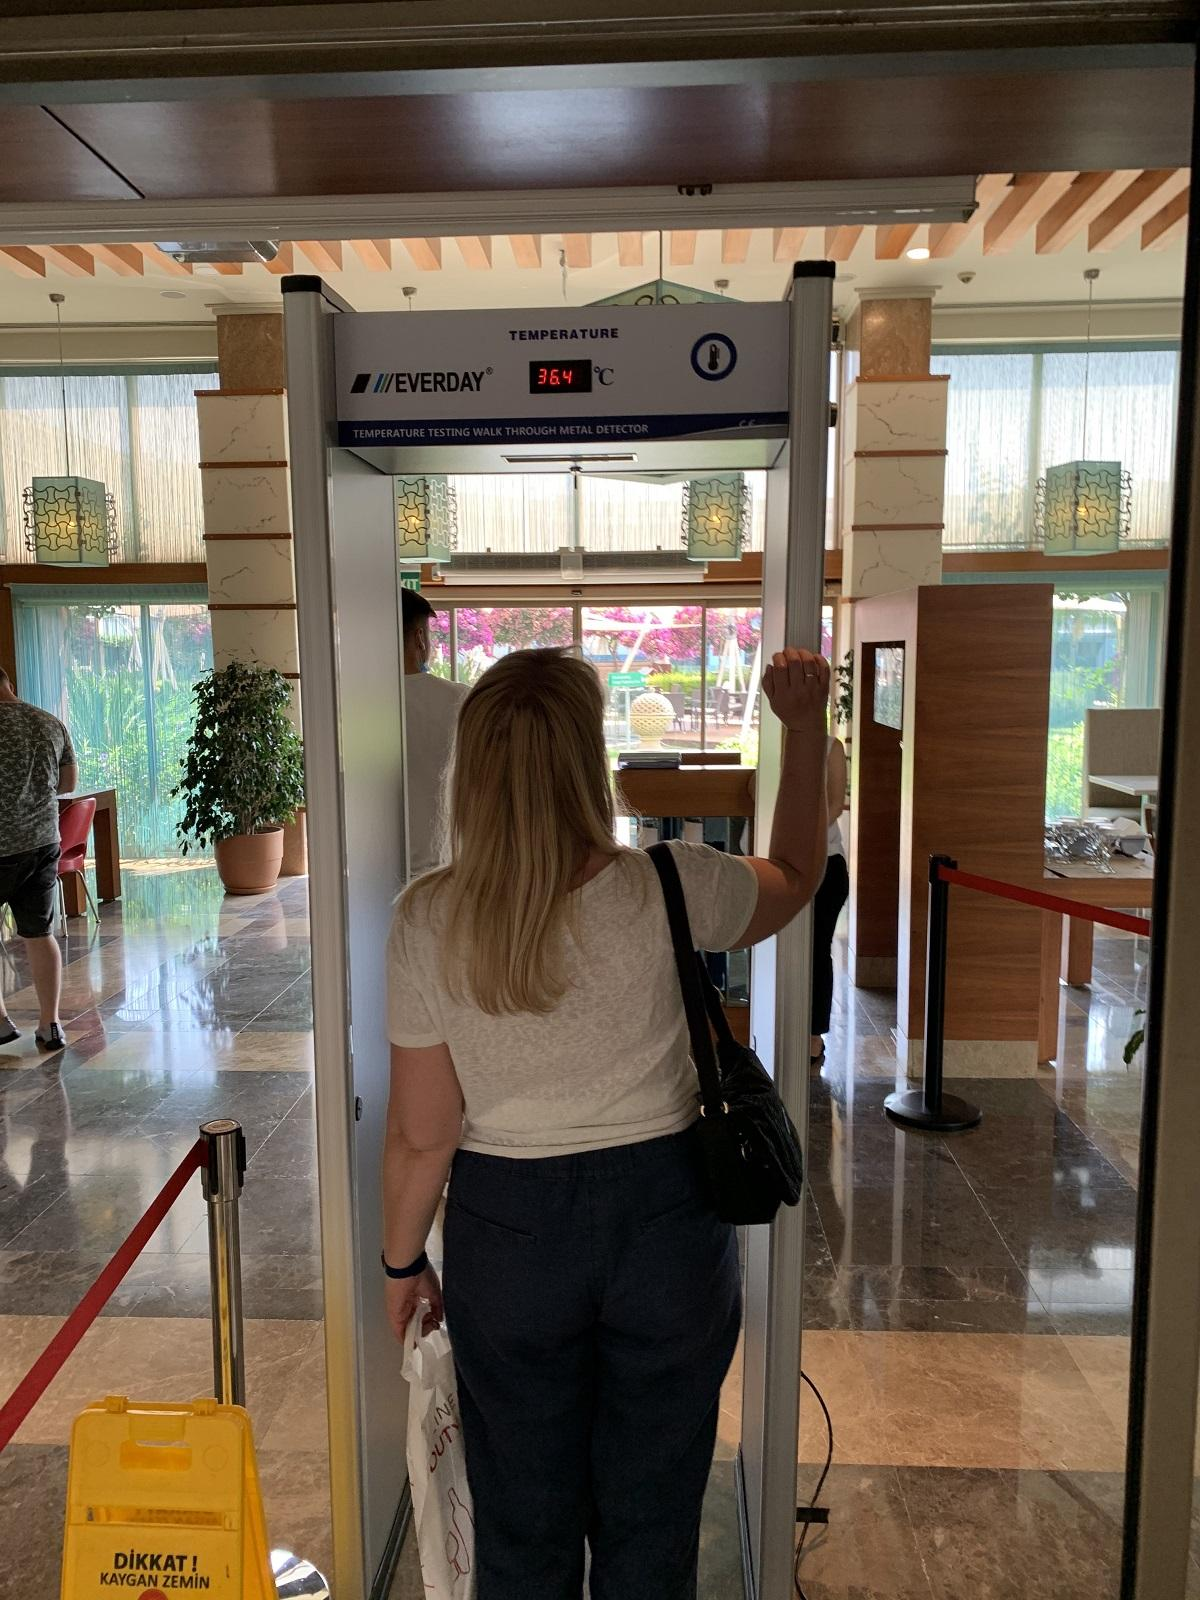 Не померяешь температуру – не позавтракаешь. Меры безопасности на входе в ресторан отеля Hilton Dalaman Sarıgerme Resort & Spa